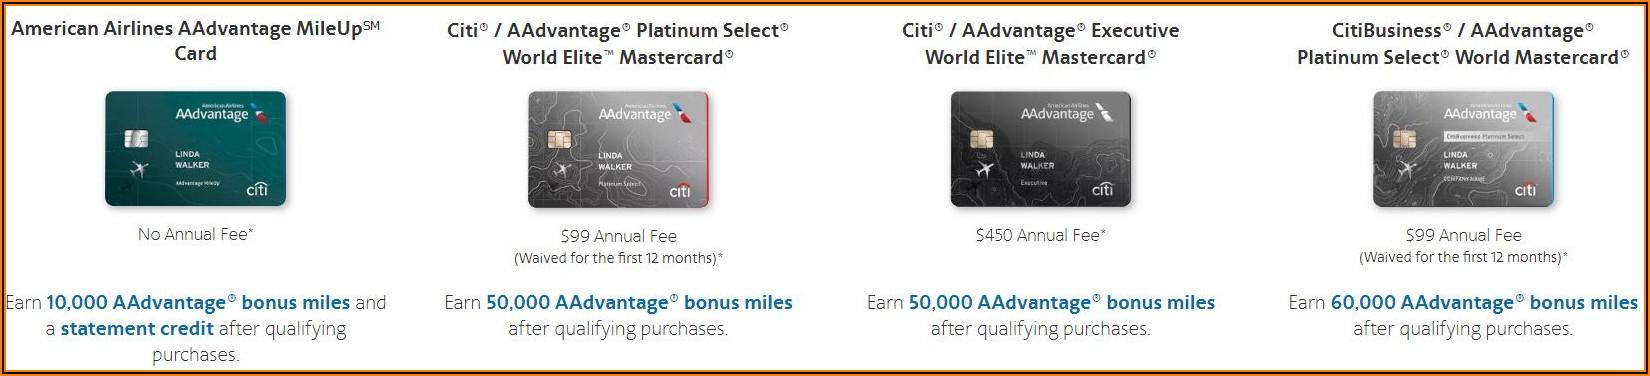 Citi Cards Business Aadvantage Card